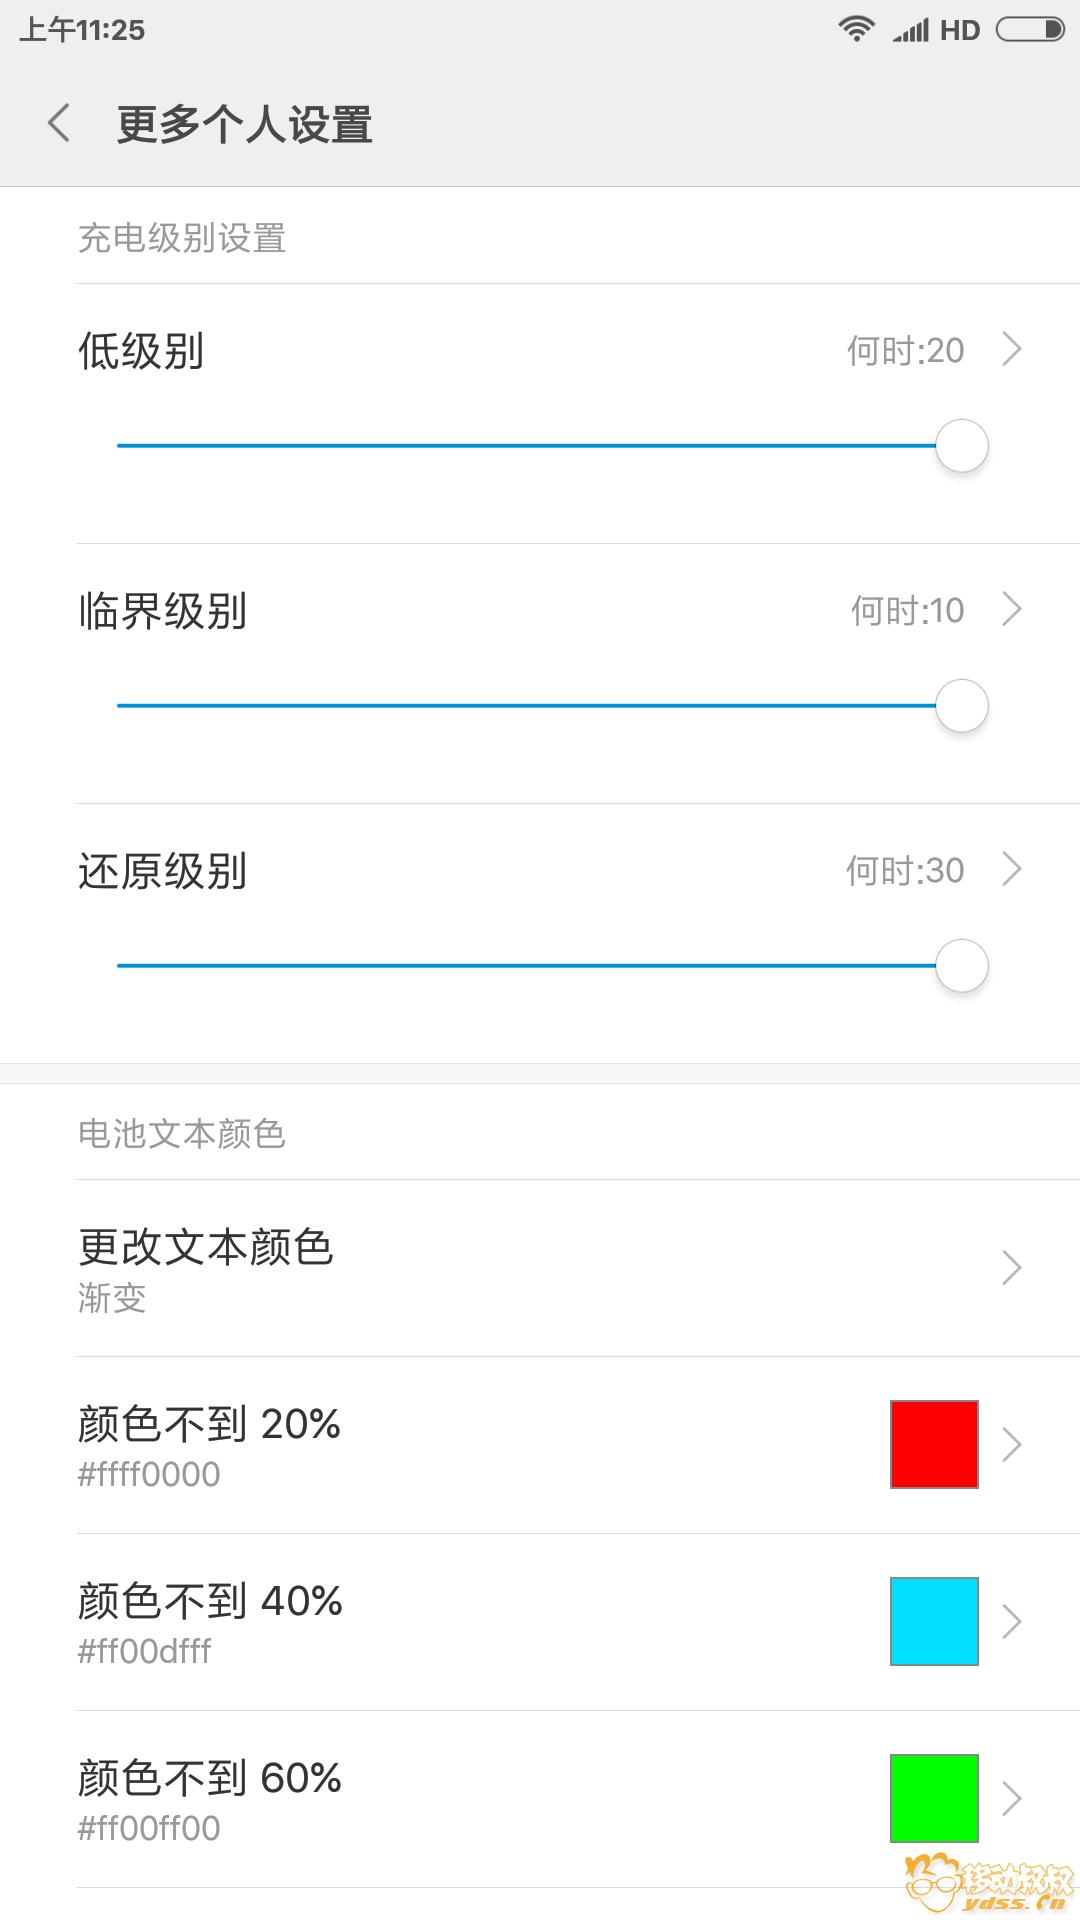 Screenshot_2018-05-04-11-25-30-837_com.android.settings.png